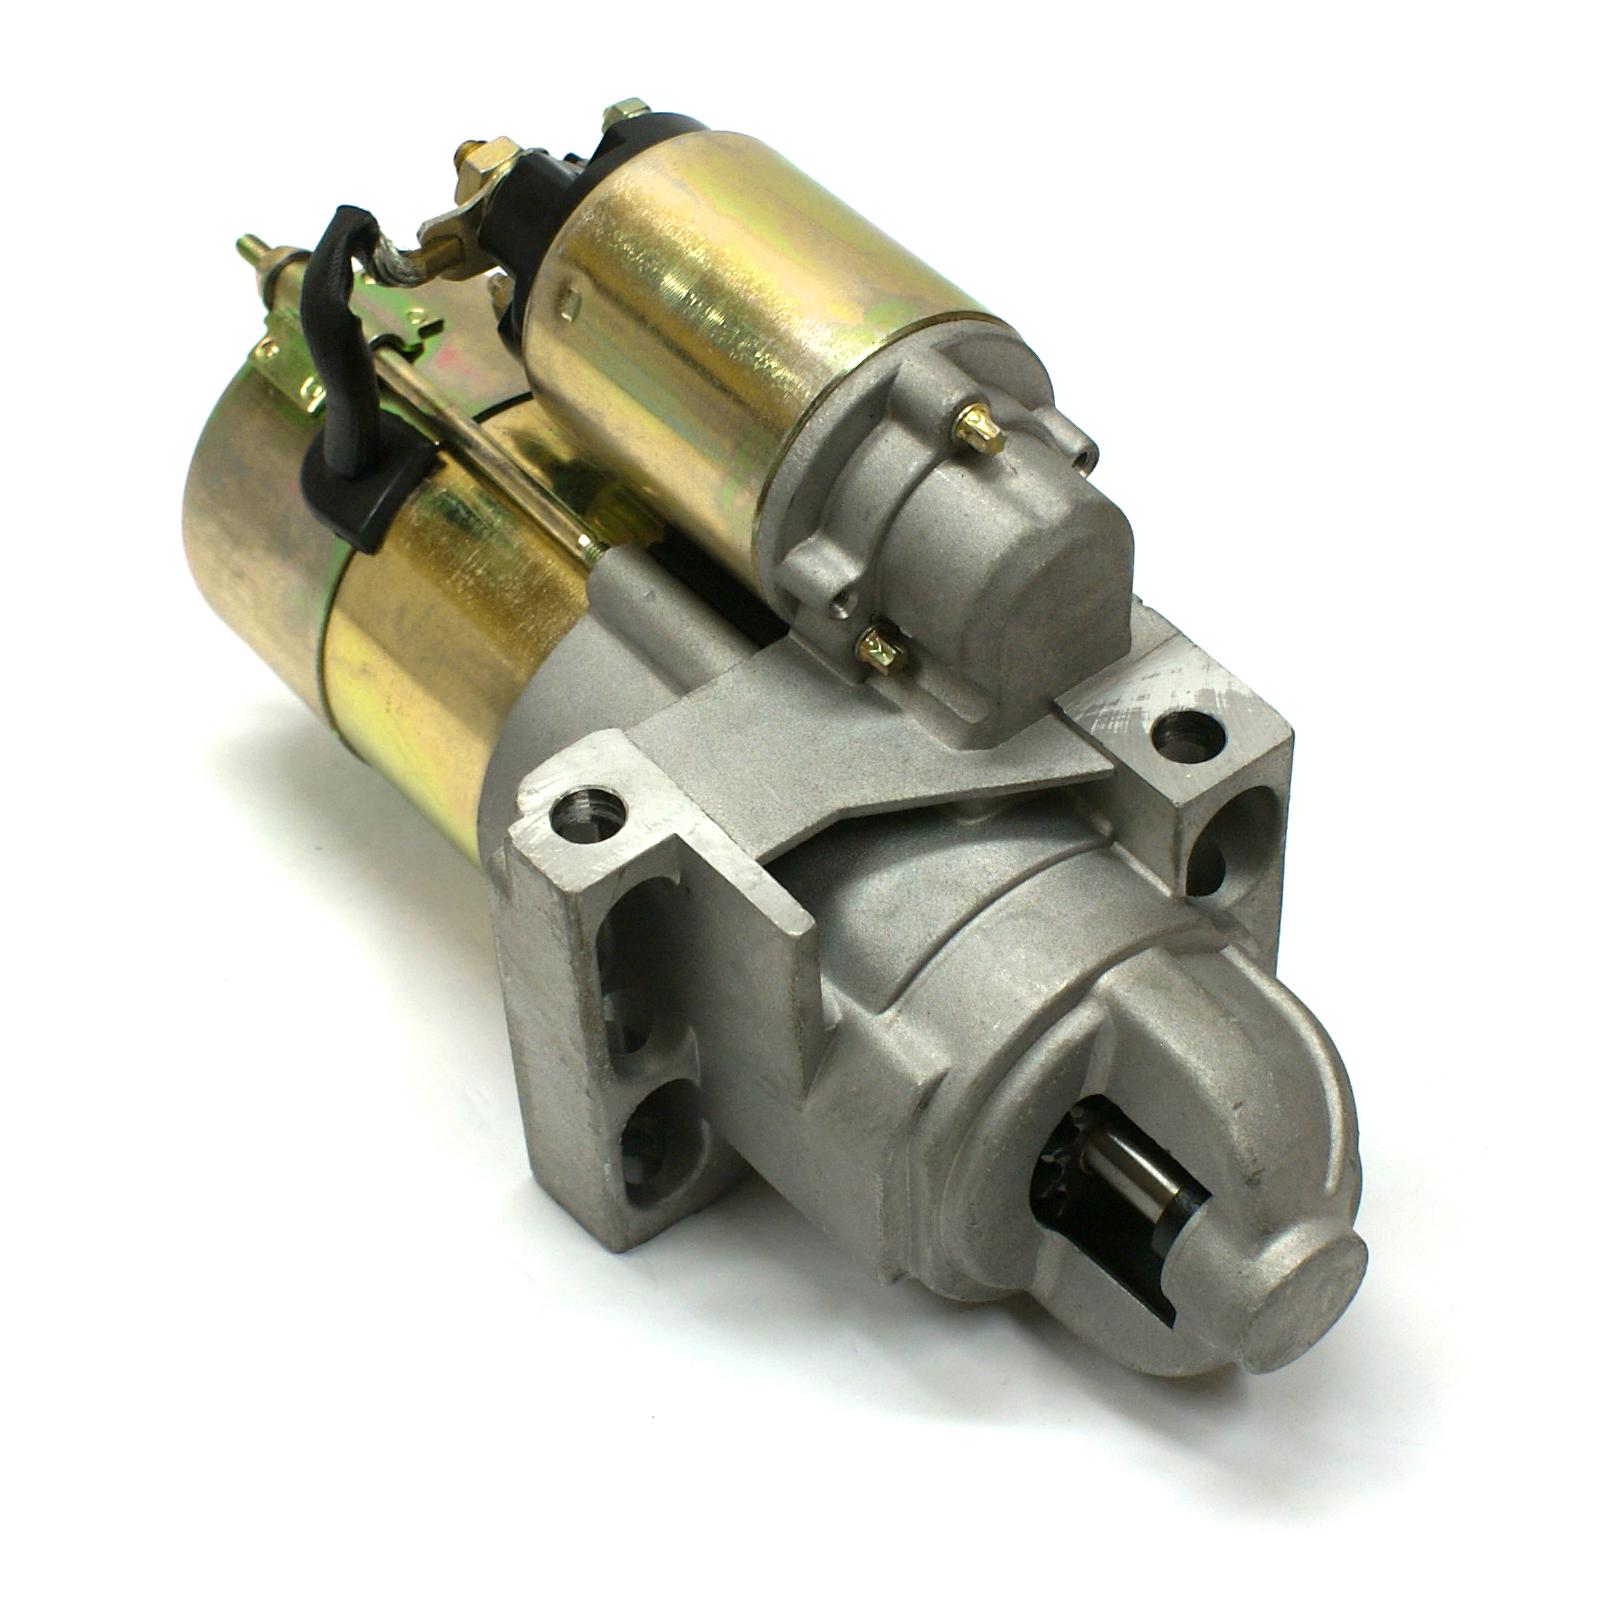 "Chevy SBC 350 BBC 454 11"" 168T Offset High Torque Starter Motor Black"